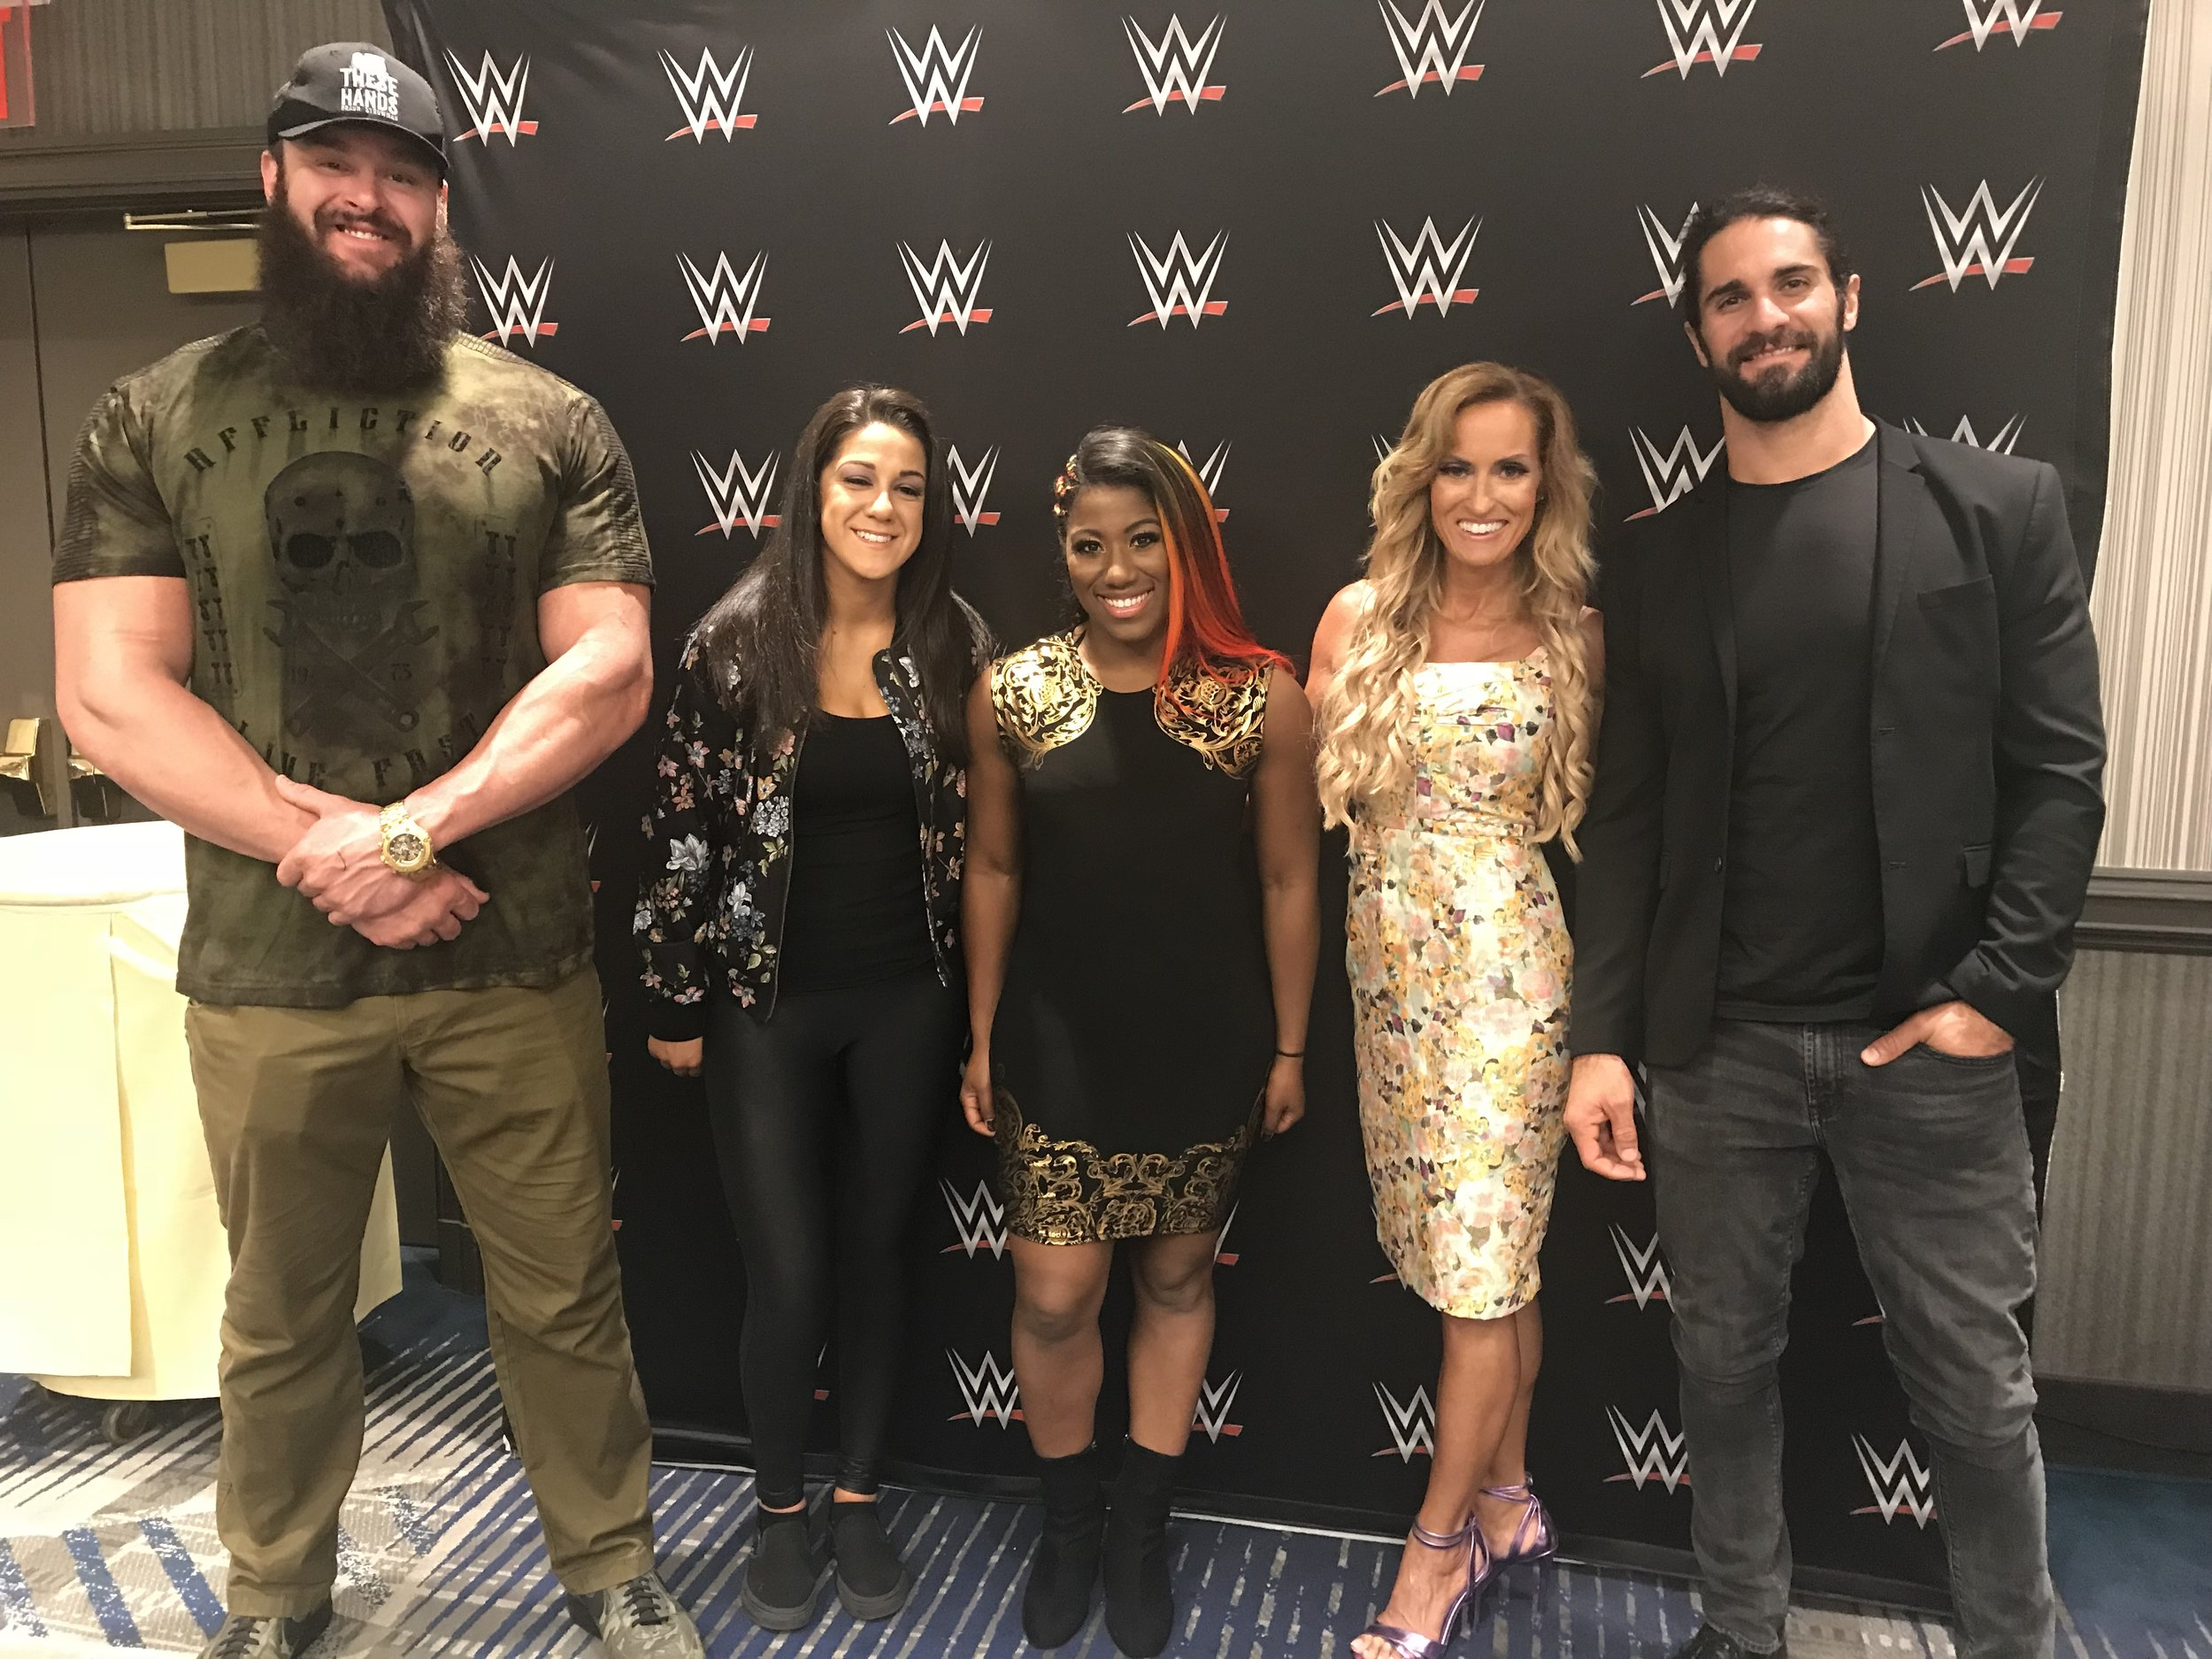 Dana Warrior WWE (Hair & Makeup)